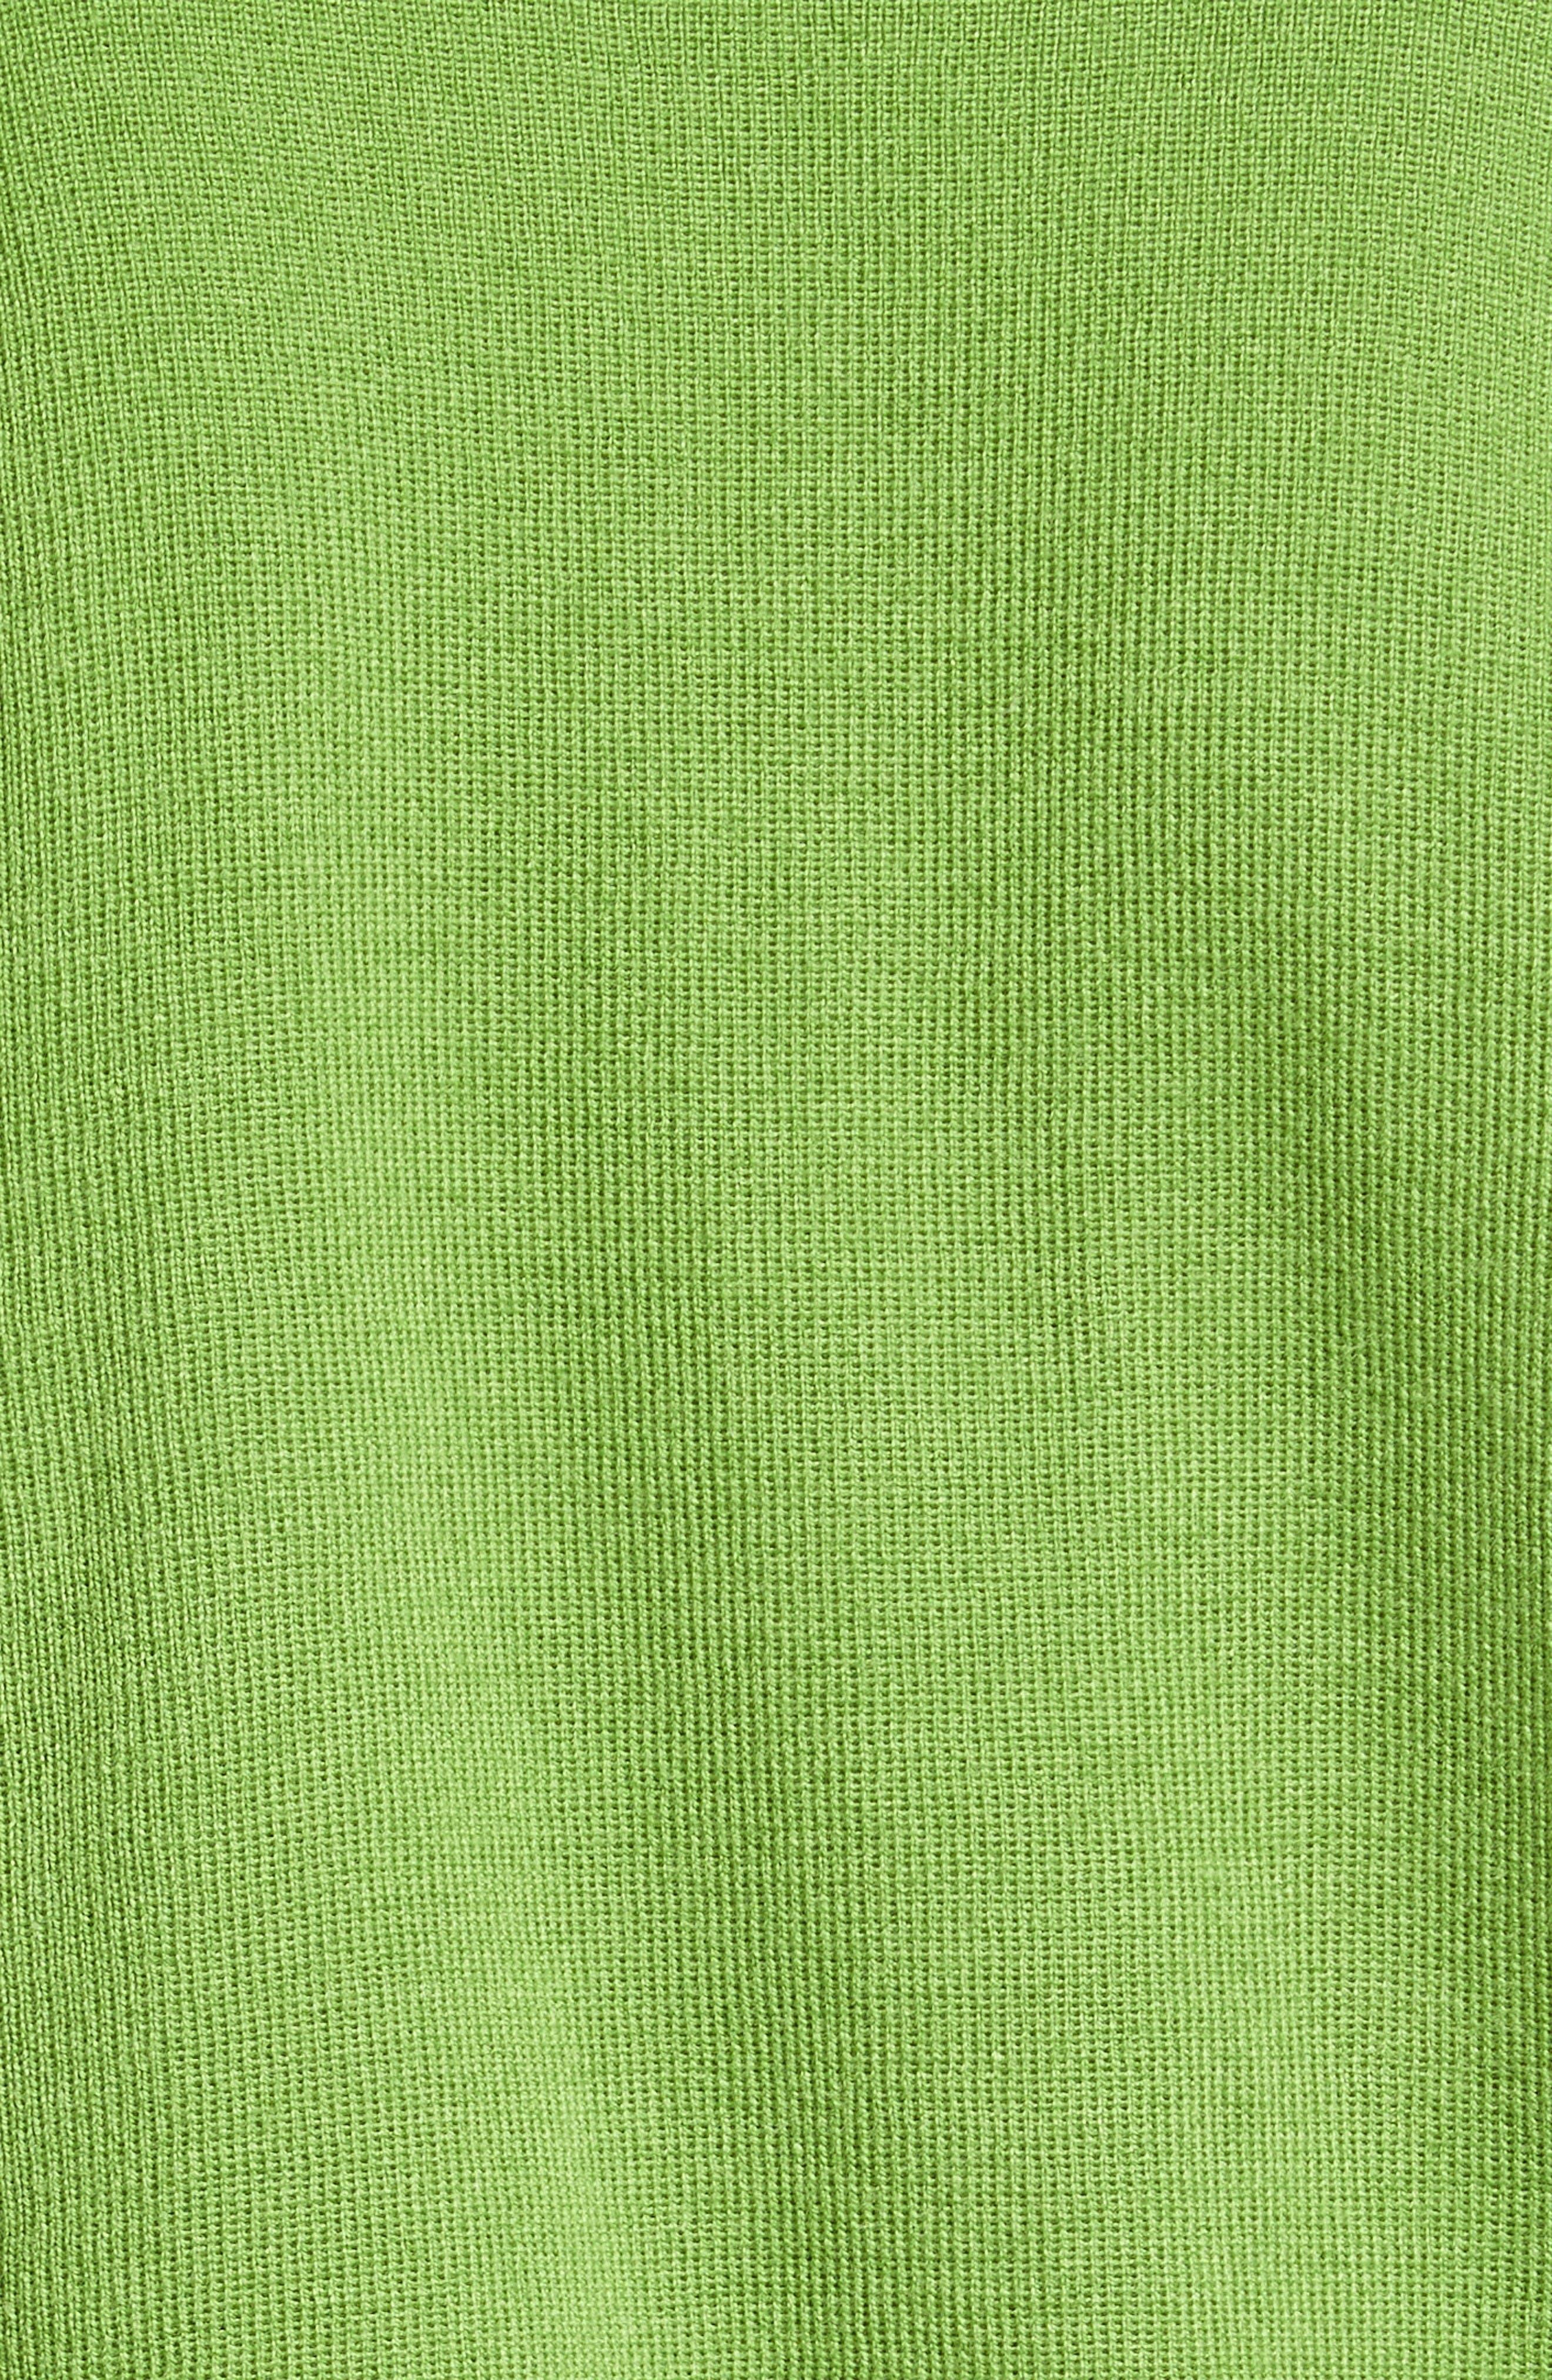 Alternate Image 3  - Molly Goddard Charlie Sweater